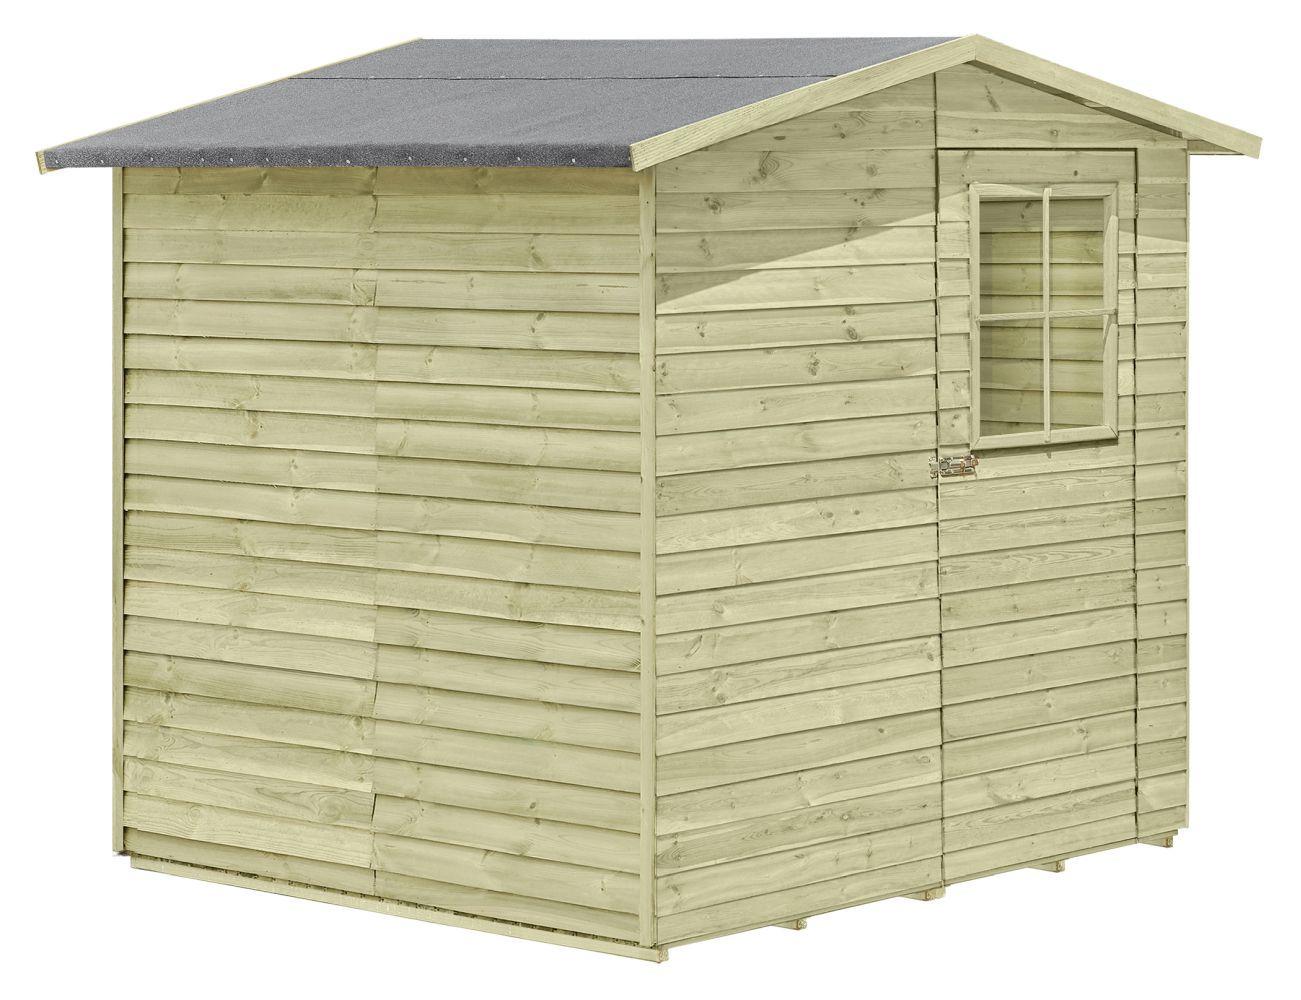 Gerätehaus 02, aus Kiefernholz, FSC® - Außenmaße: 200 x 200 x 210 cm (L x B x H)